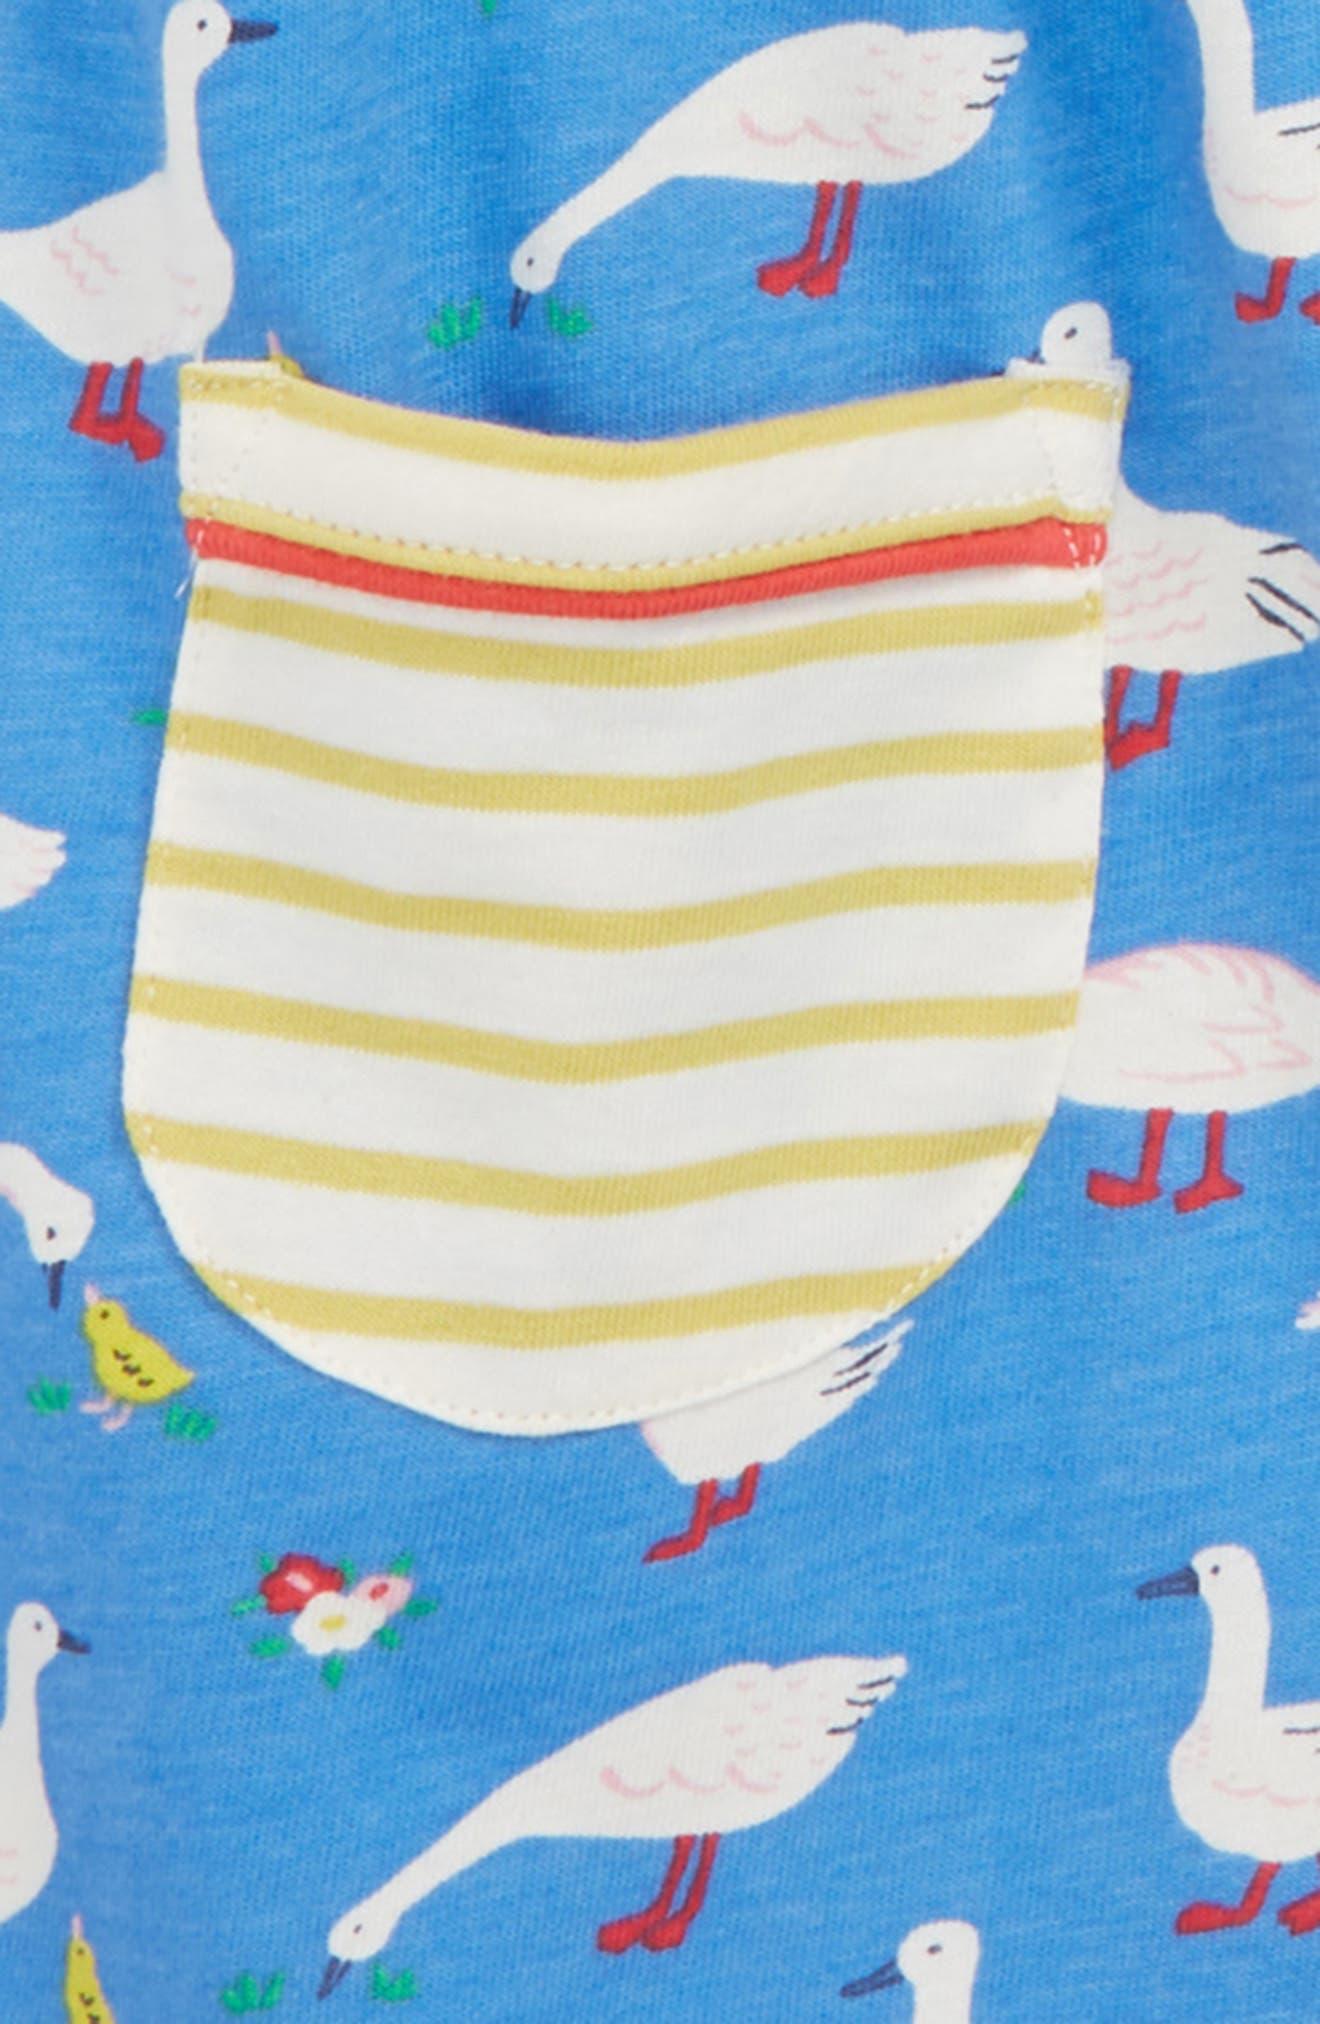 Hotchpotch Jersey Dress,                             Alternate thumbnail 2, color,                             Penzance Blue